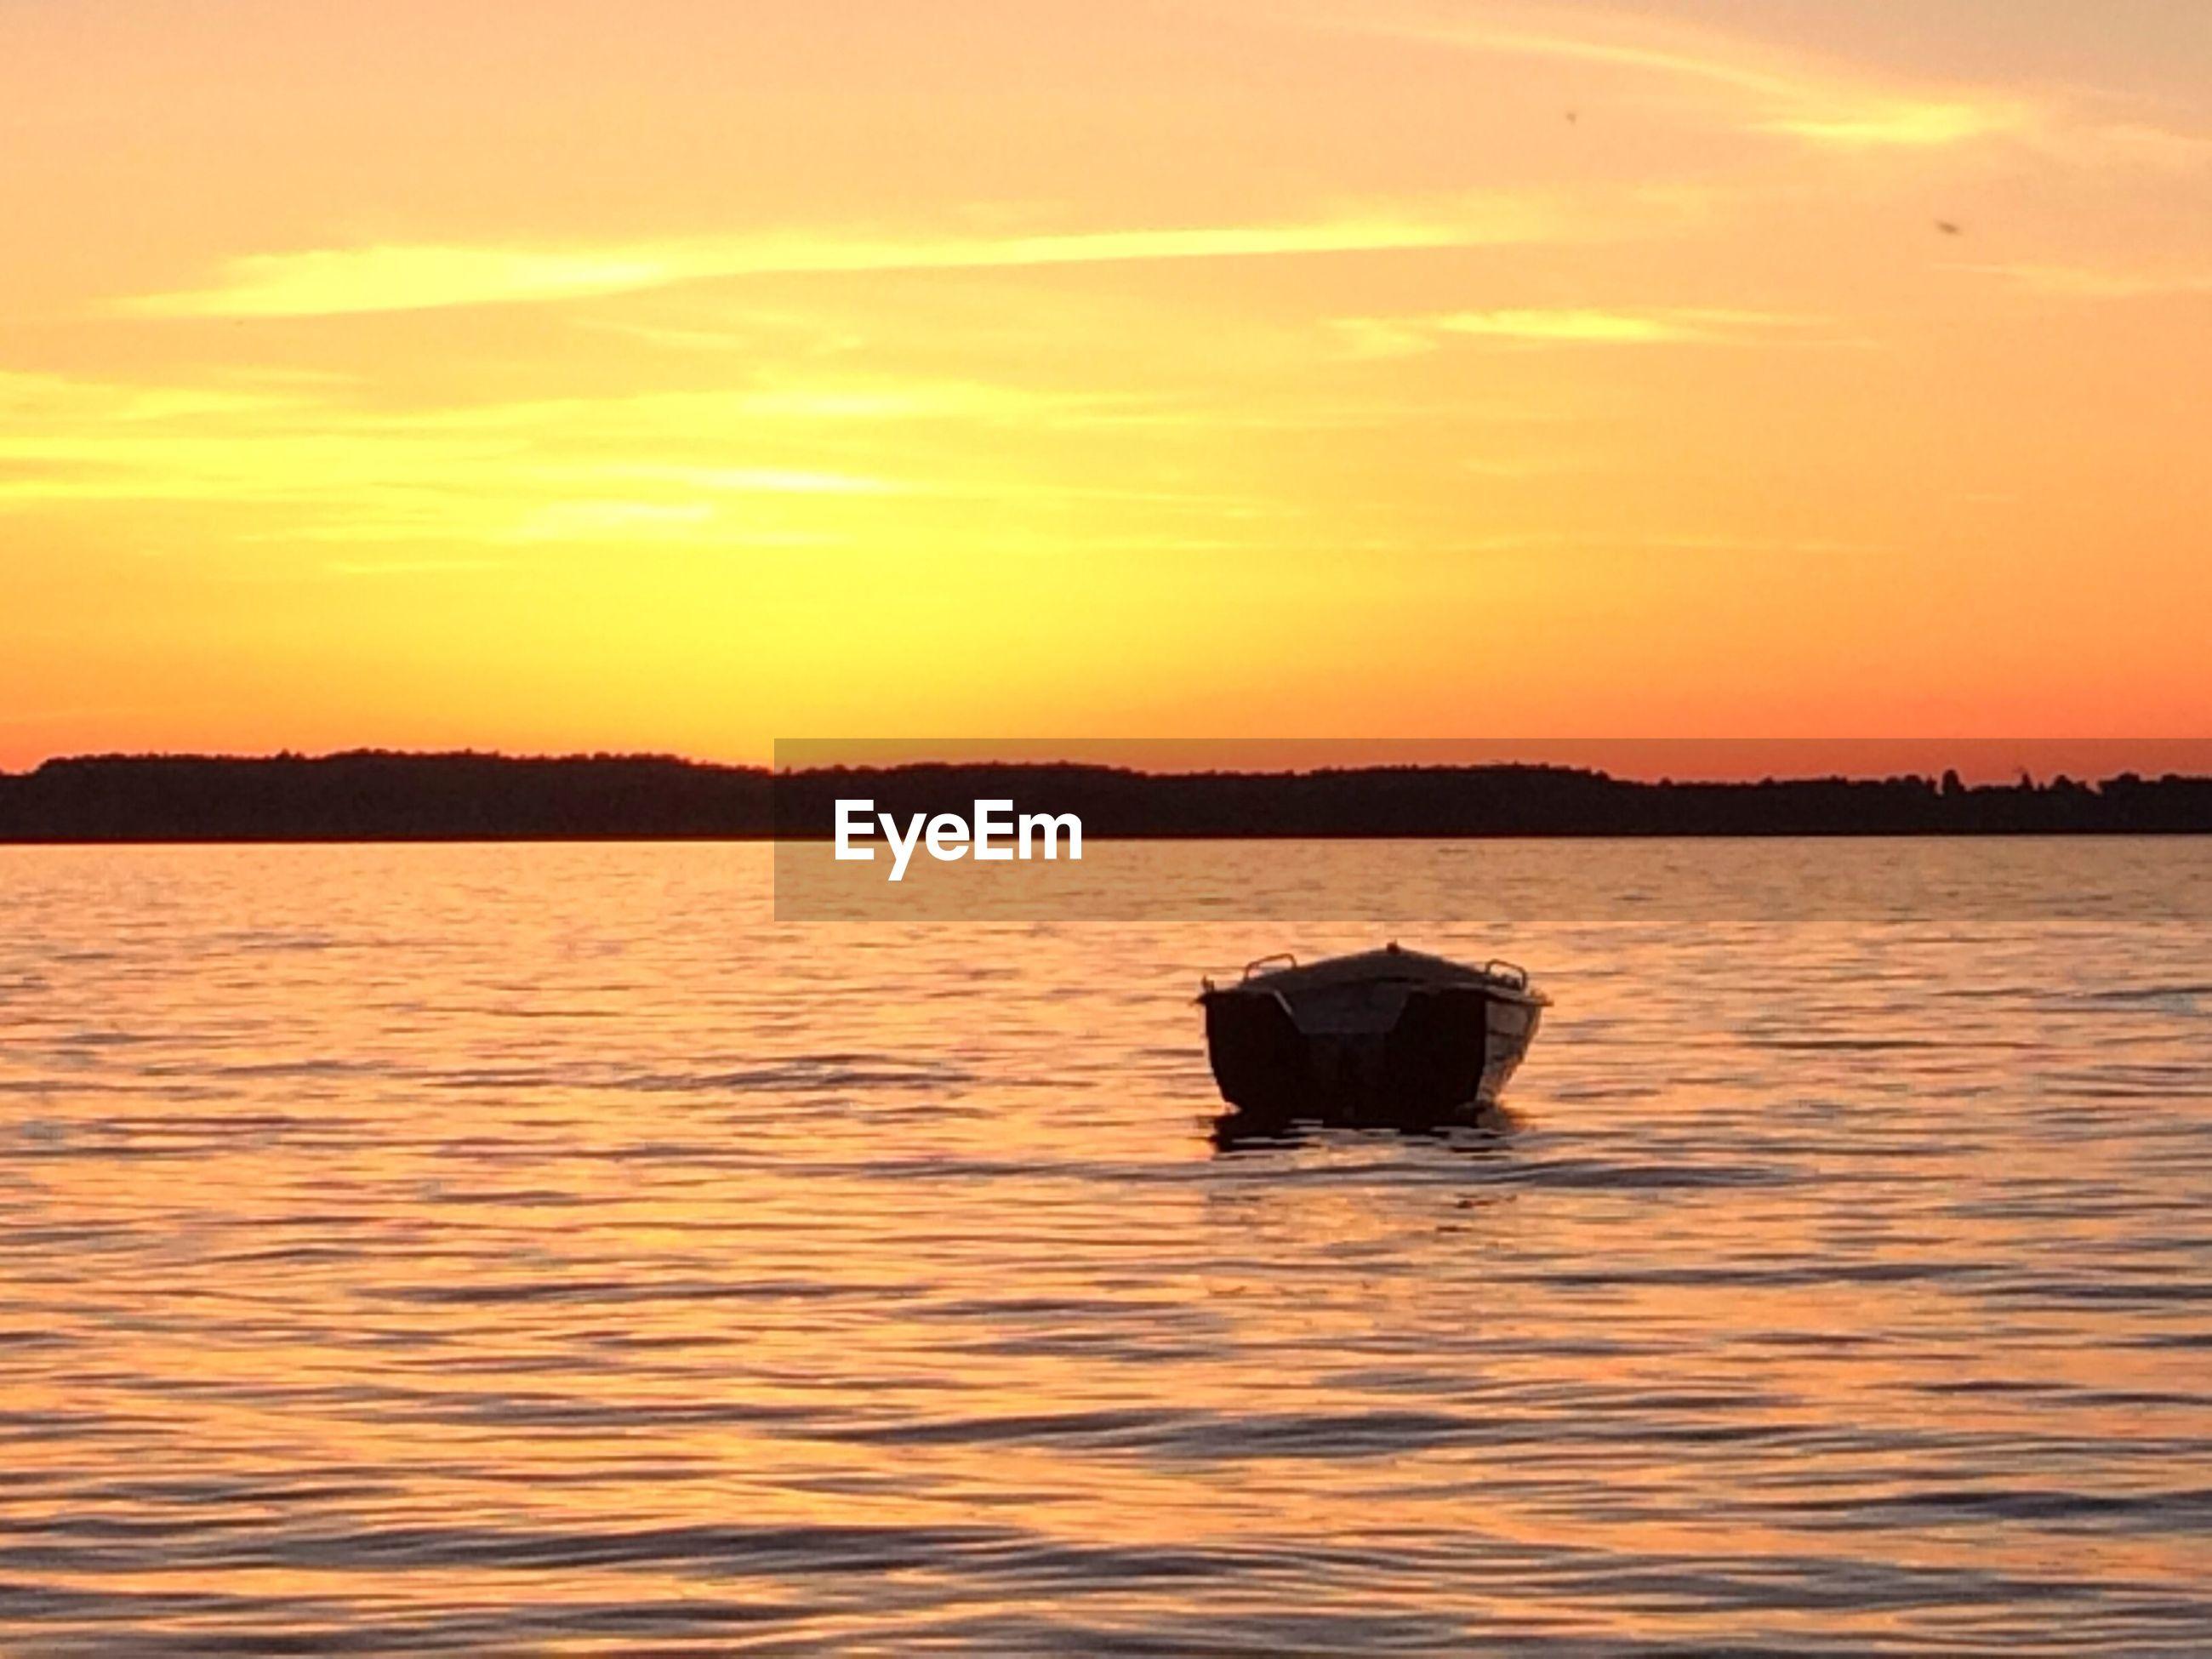 Lone boat in calm sea against scenic sky